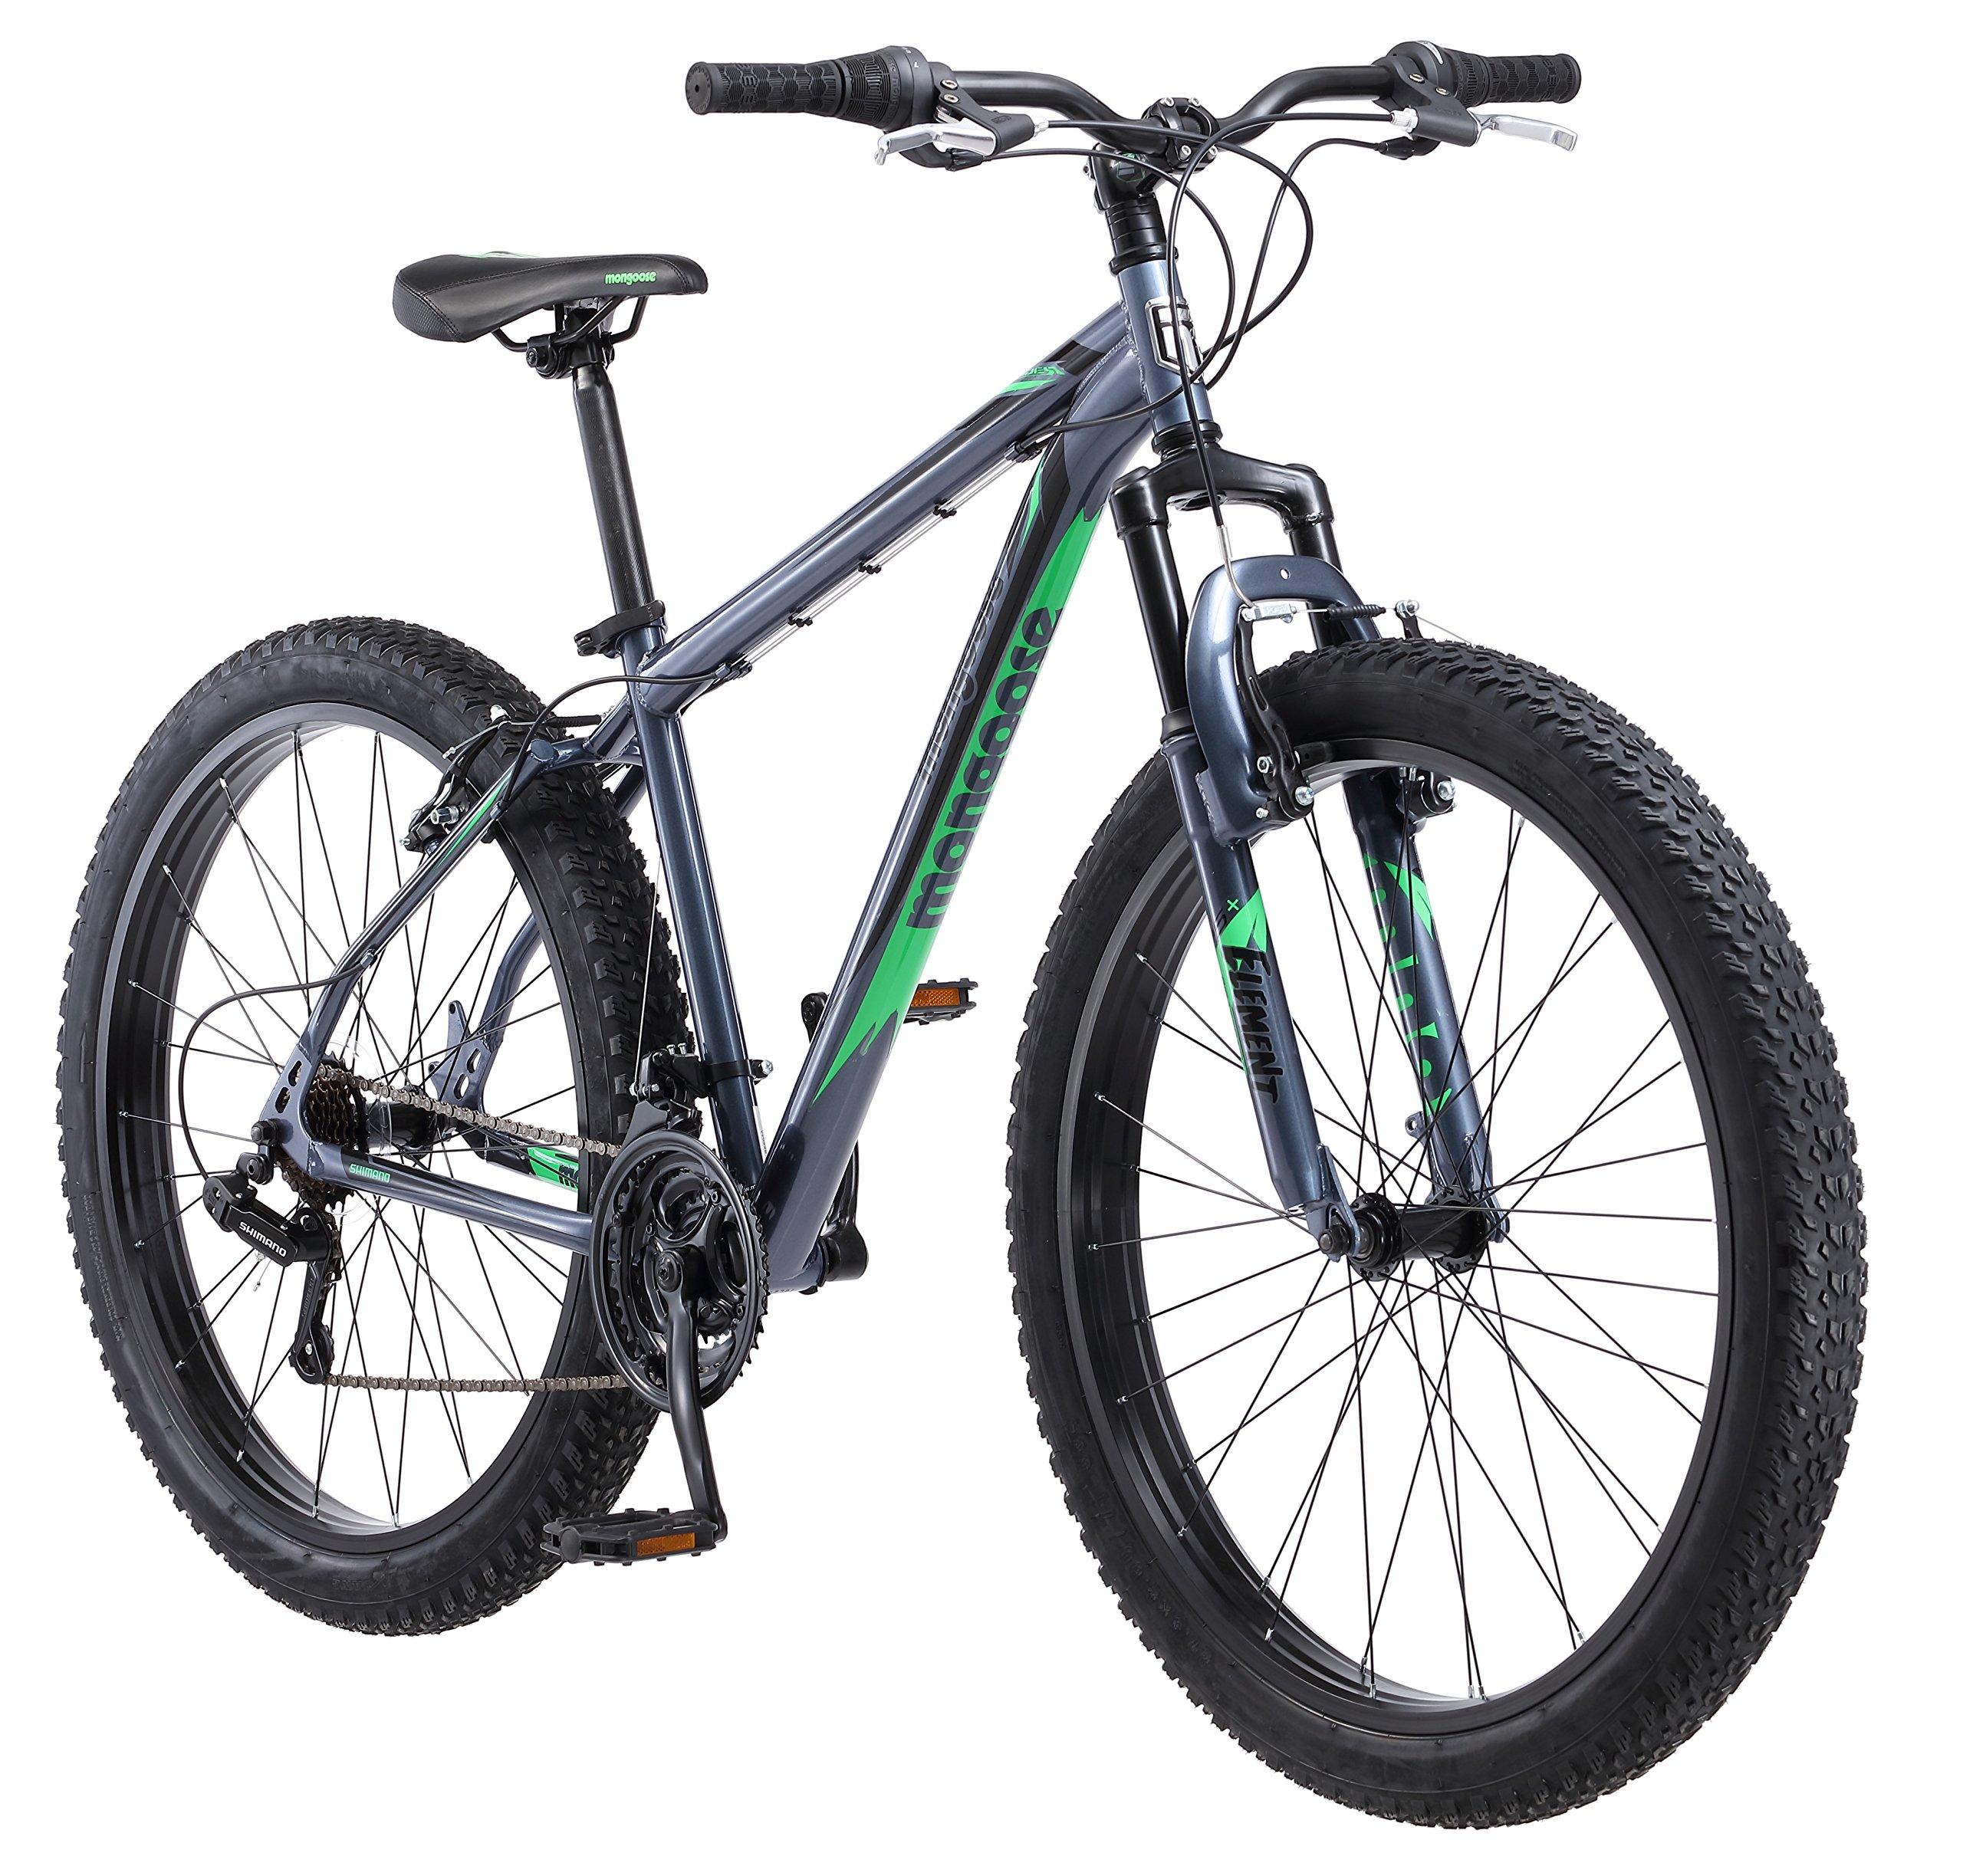 Mongoose Rader 27.5+ Men's 2.8'' Tire Fat Tire Bike Medium Frame Size Grey